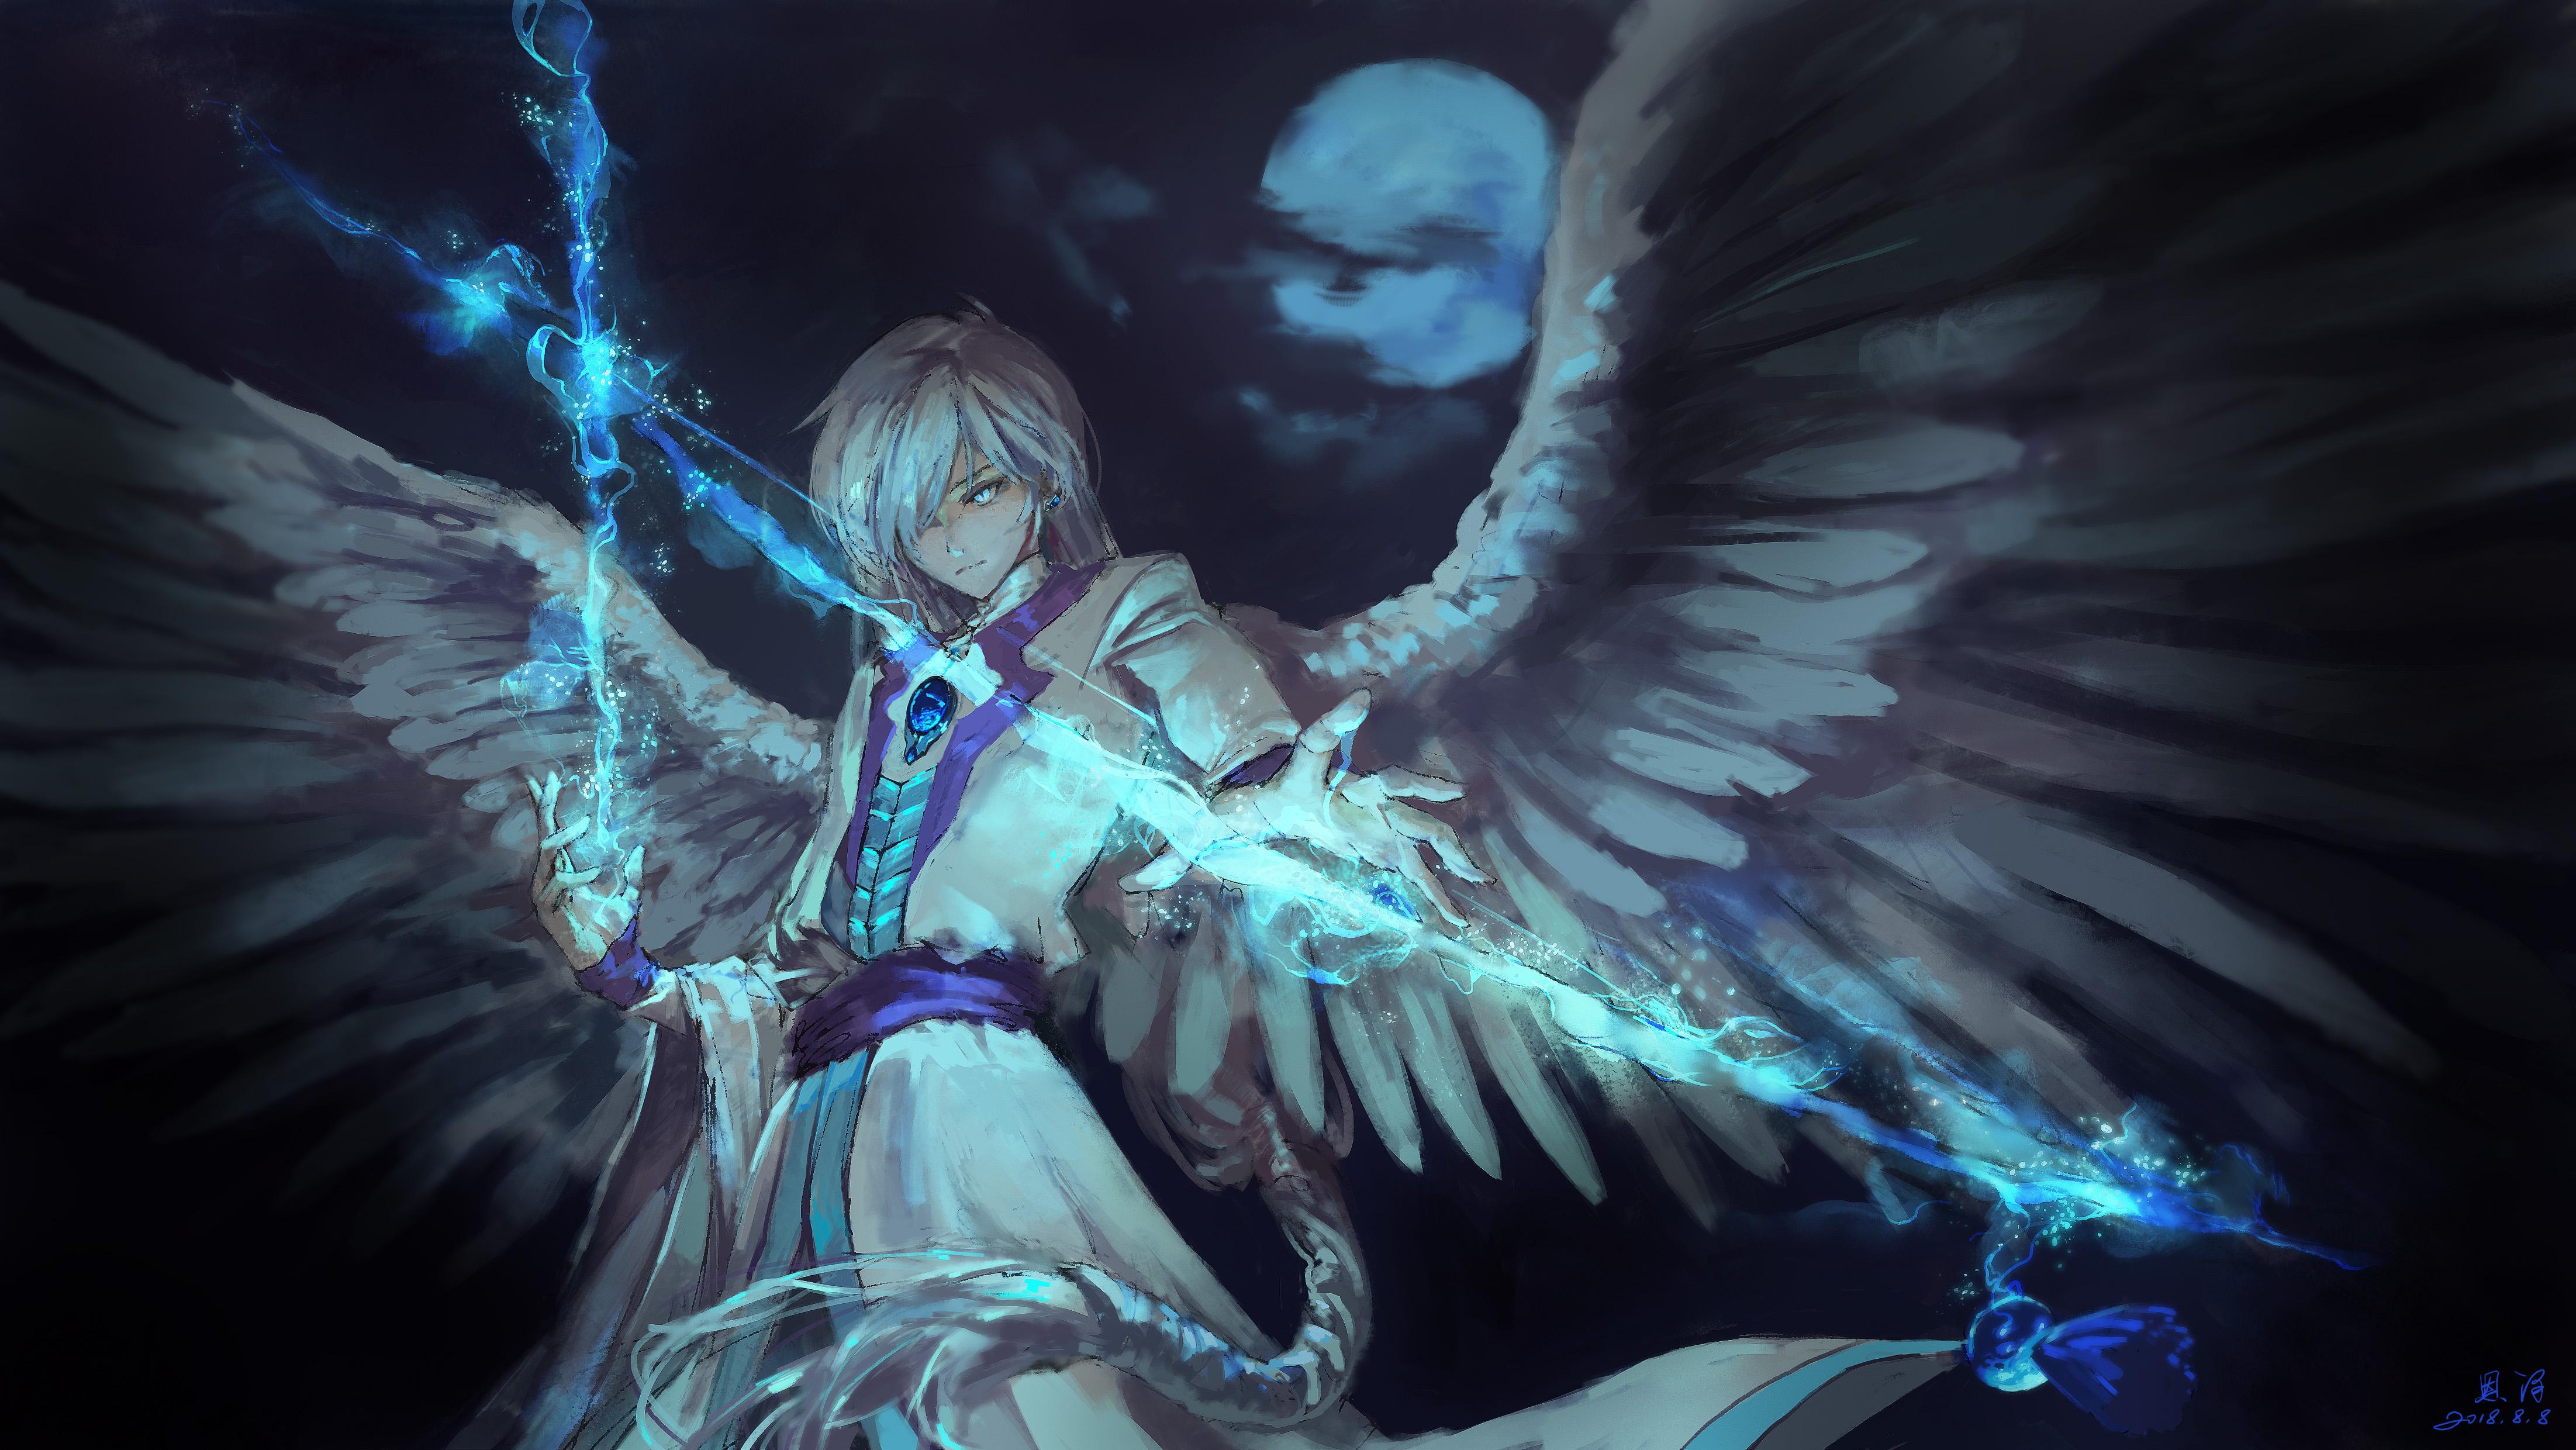 3840x2400 anime angel boy with magical arrow 4k hd 4k - Dark angel anime wallpaper ...